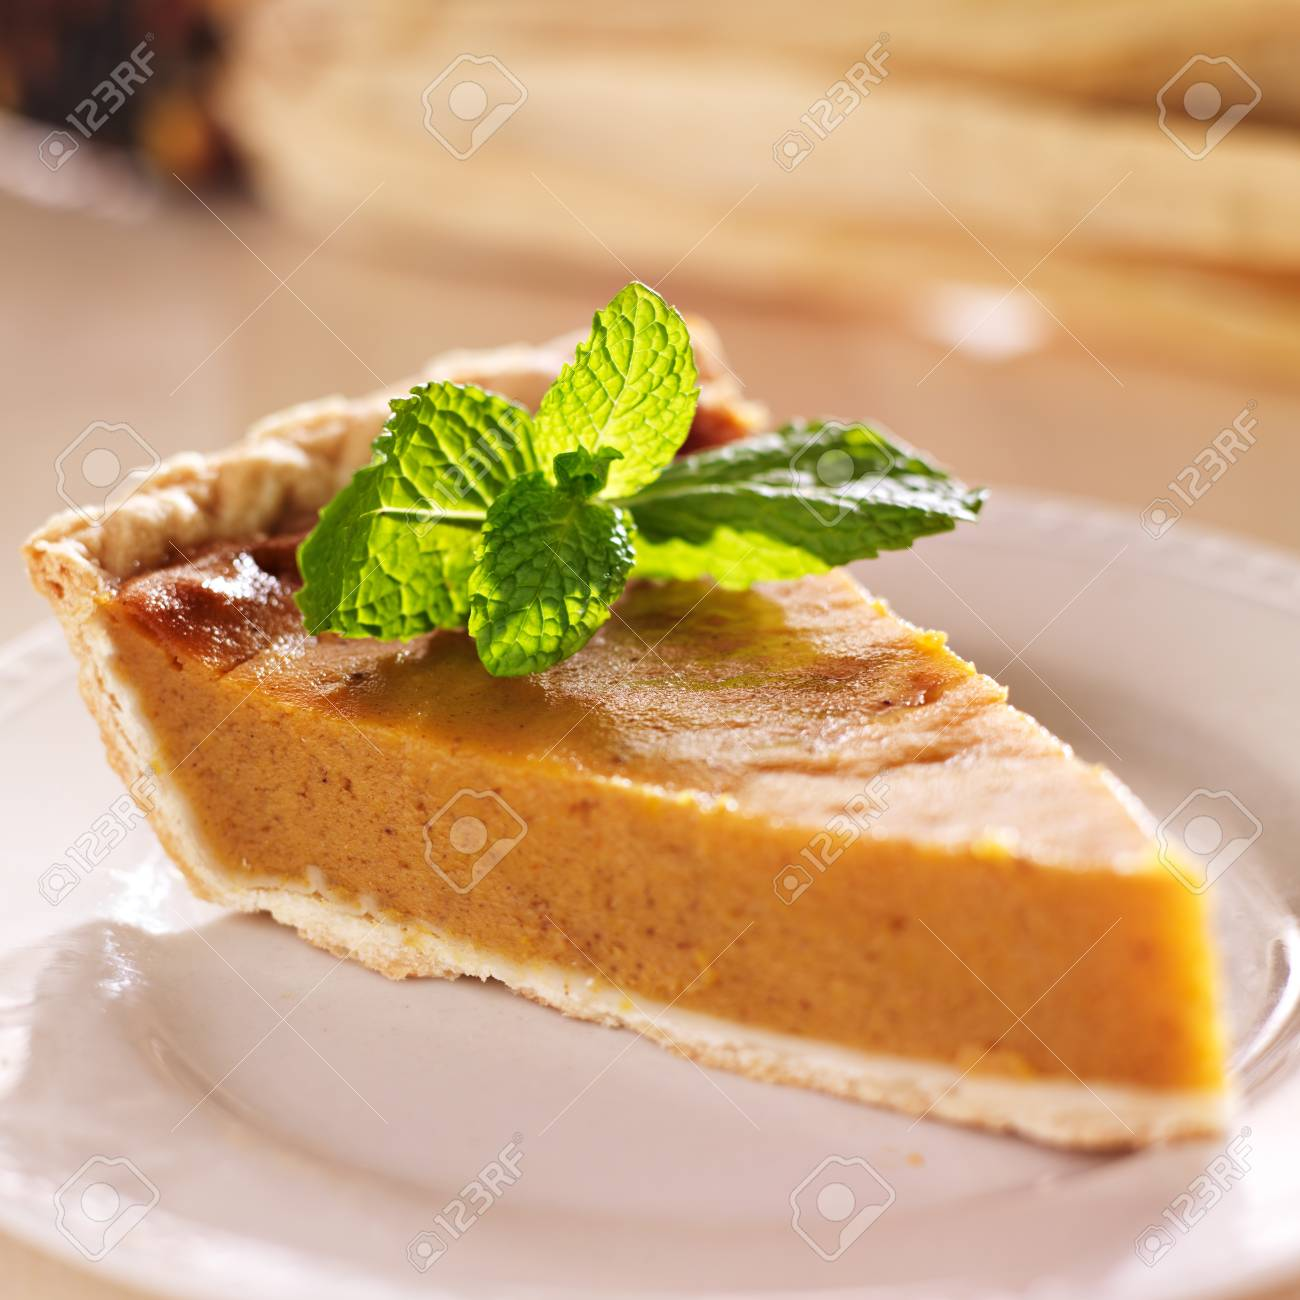 pumpkin pie with mint garnish closeup Stock Photo - 21957508